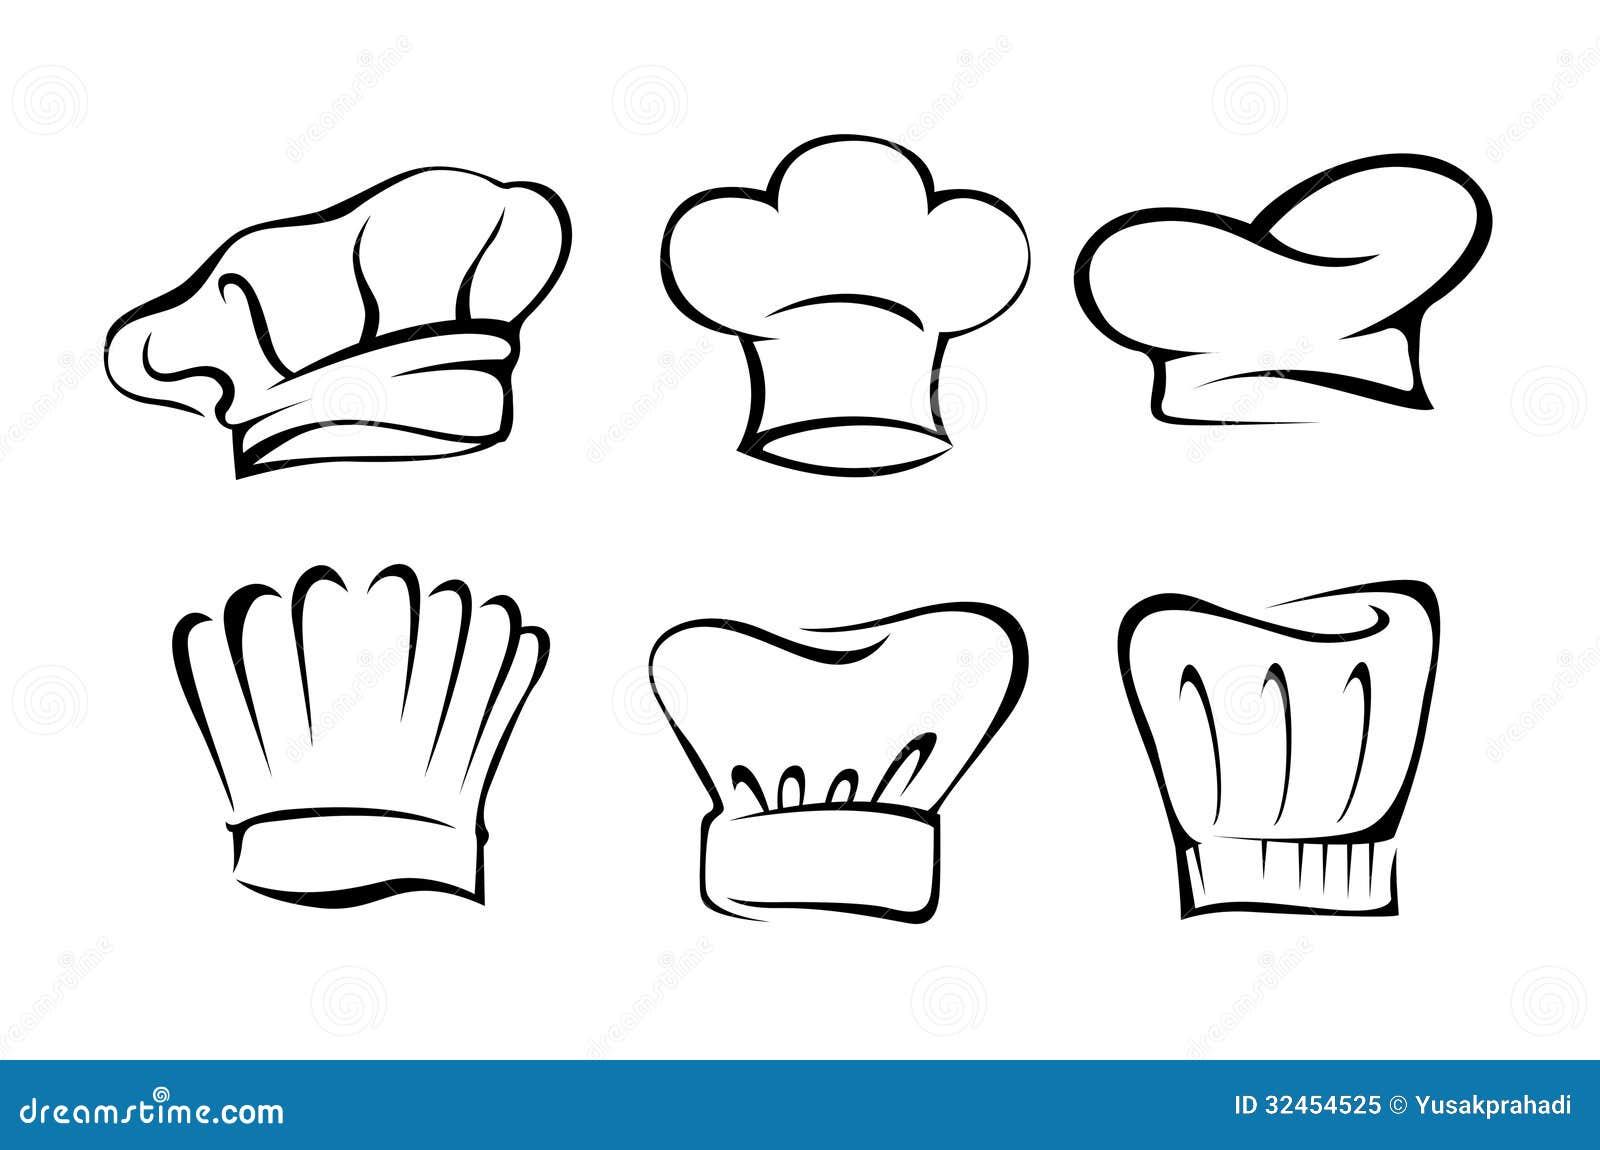 Chef Hat Set Royalty Free Stock Photo - Image: 32454525